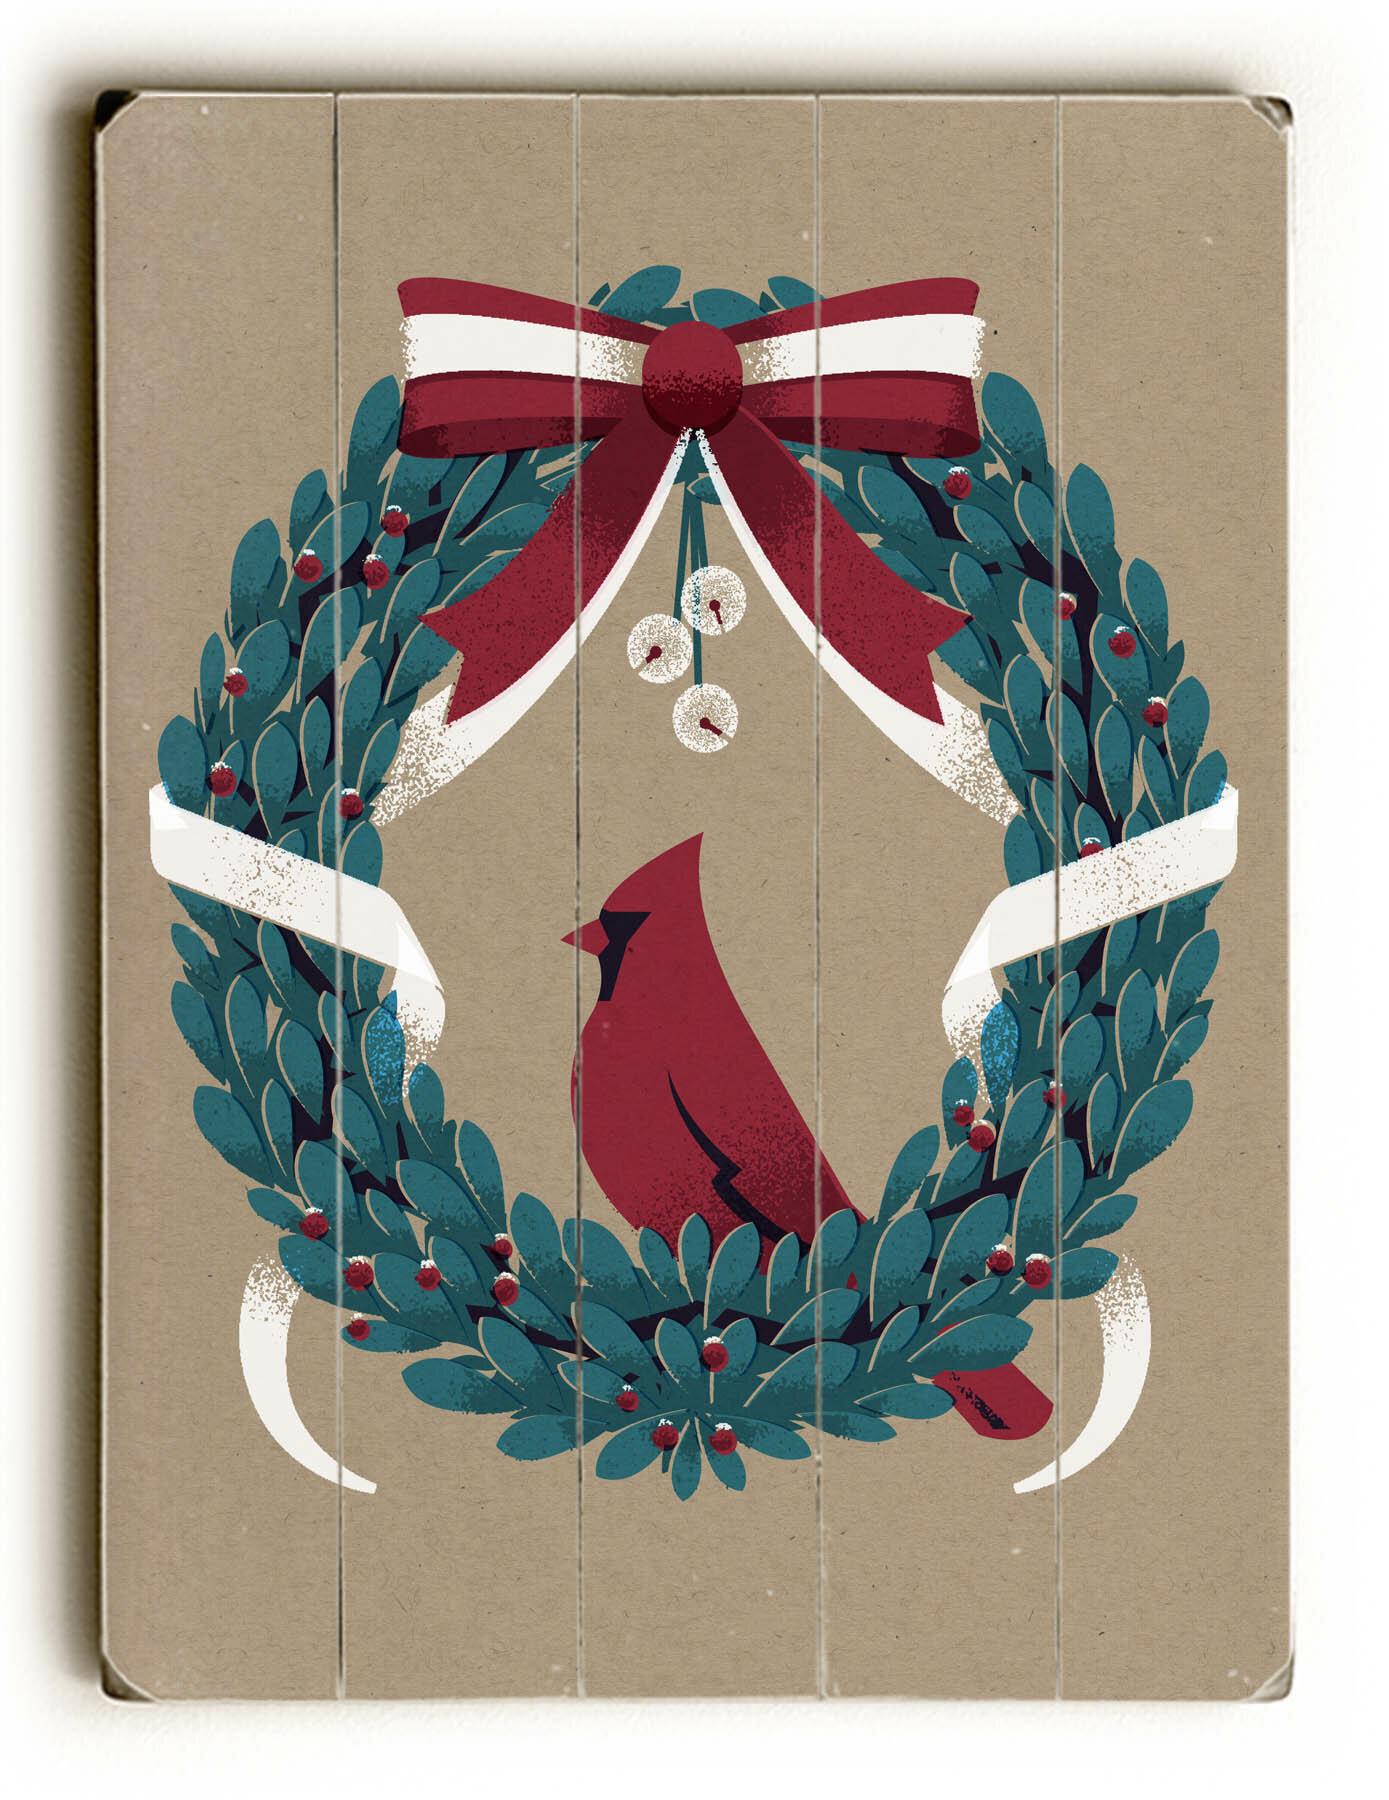 The Holiday Aisle Vintage Wreath Graphic Art Plaque Wayfair